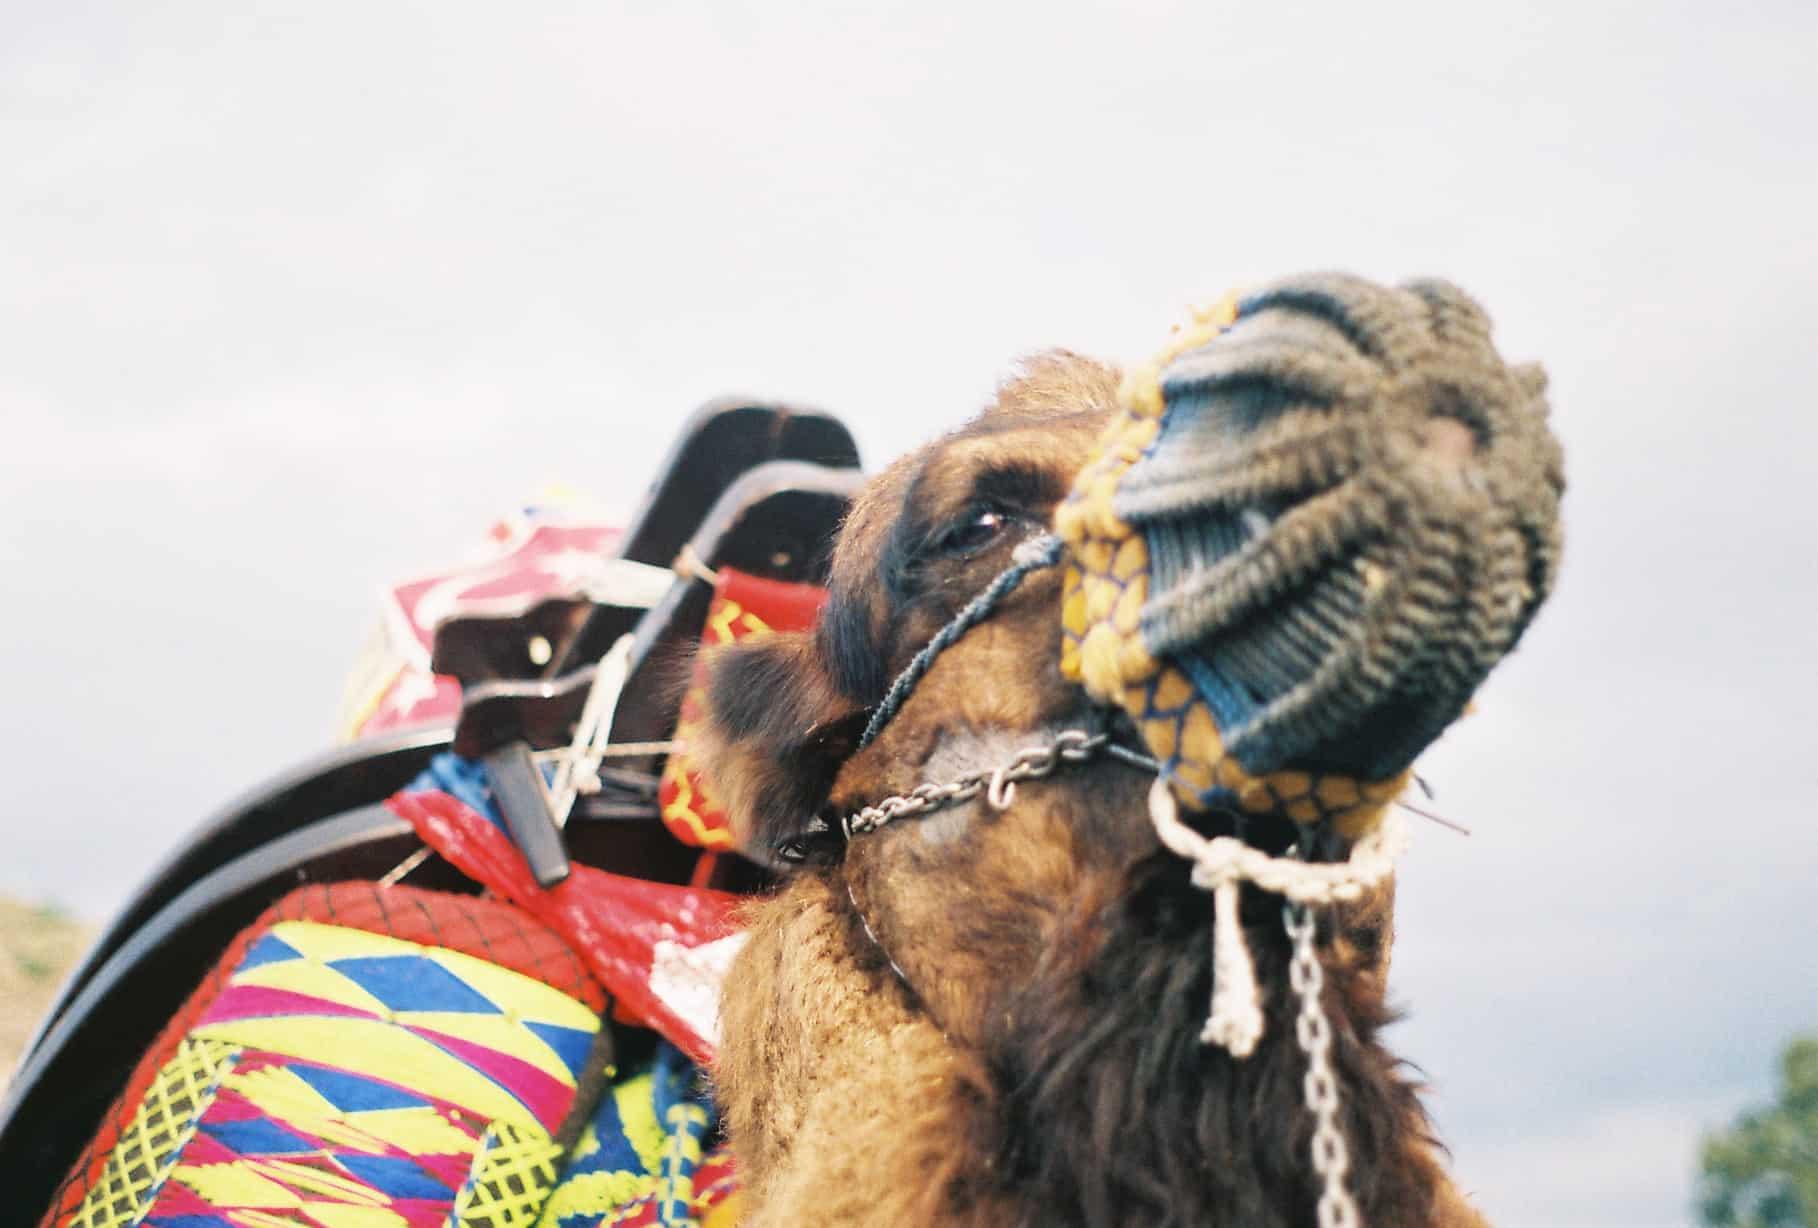 Glorious Camel (camel wrestling festival)